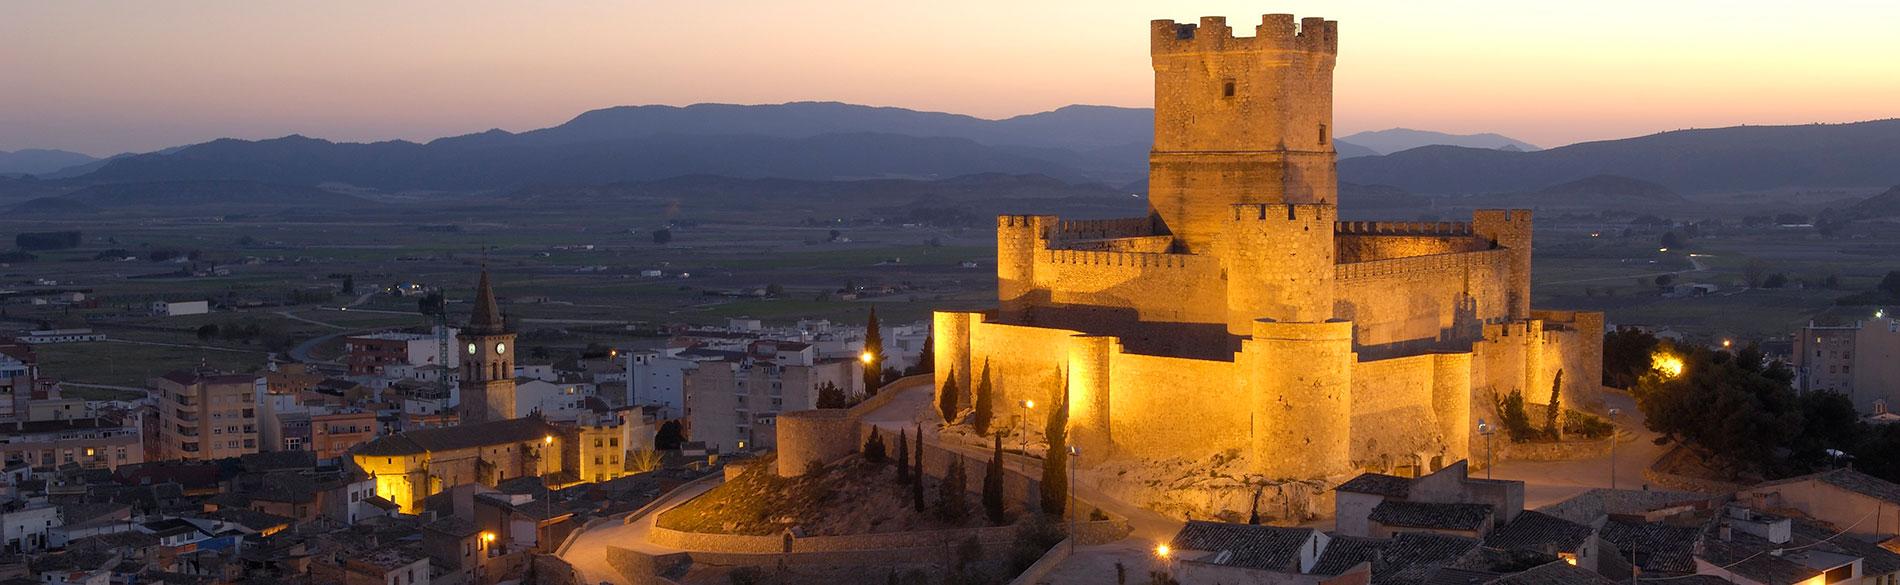 Castillo-de-Villena1